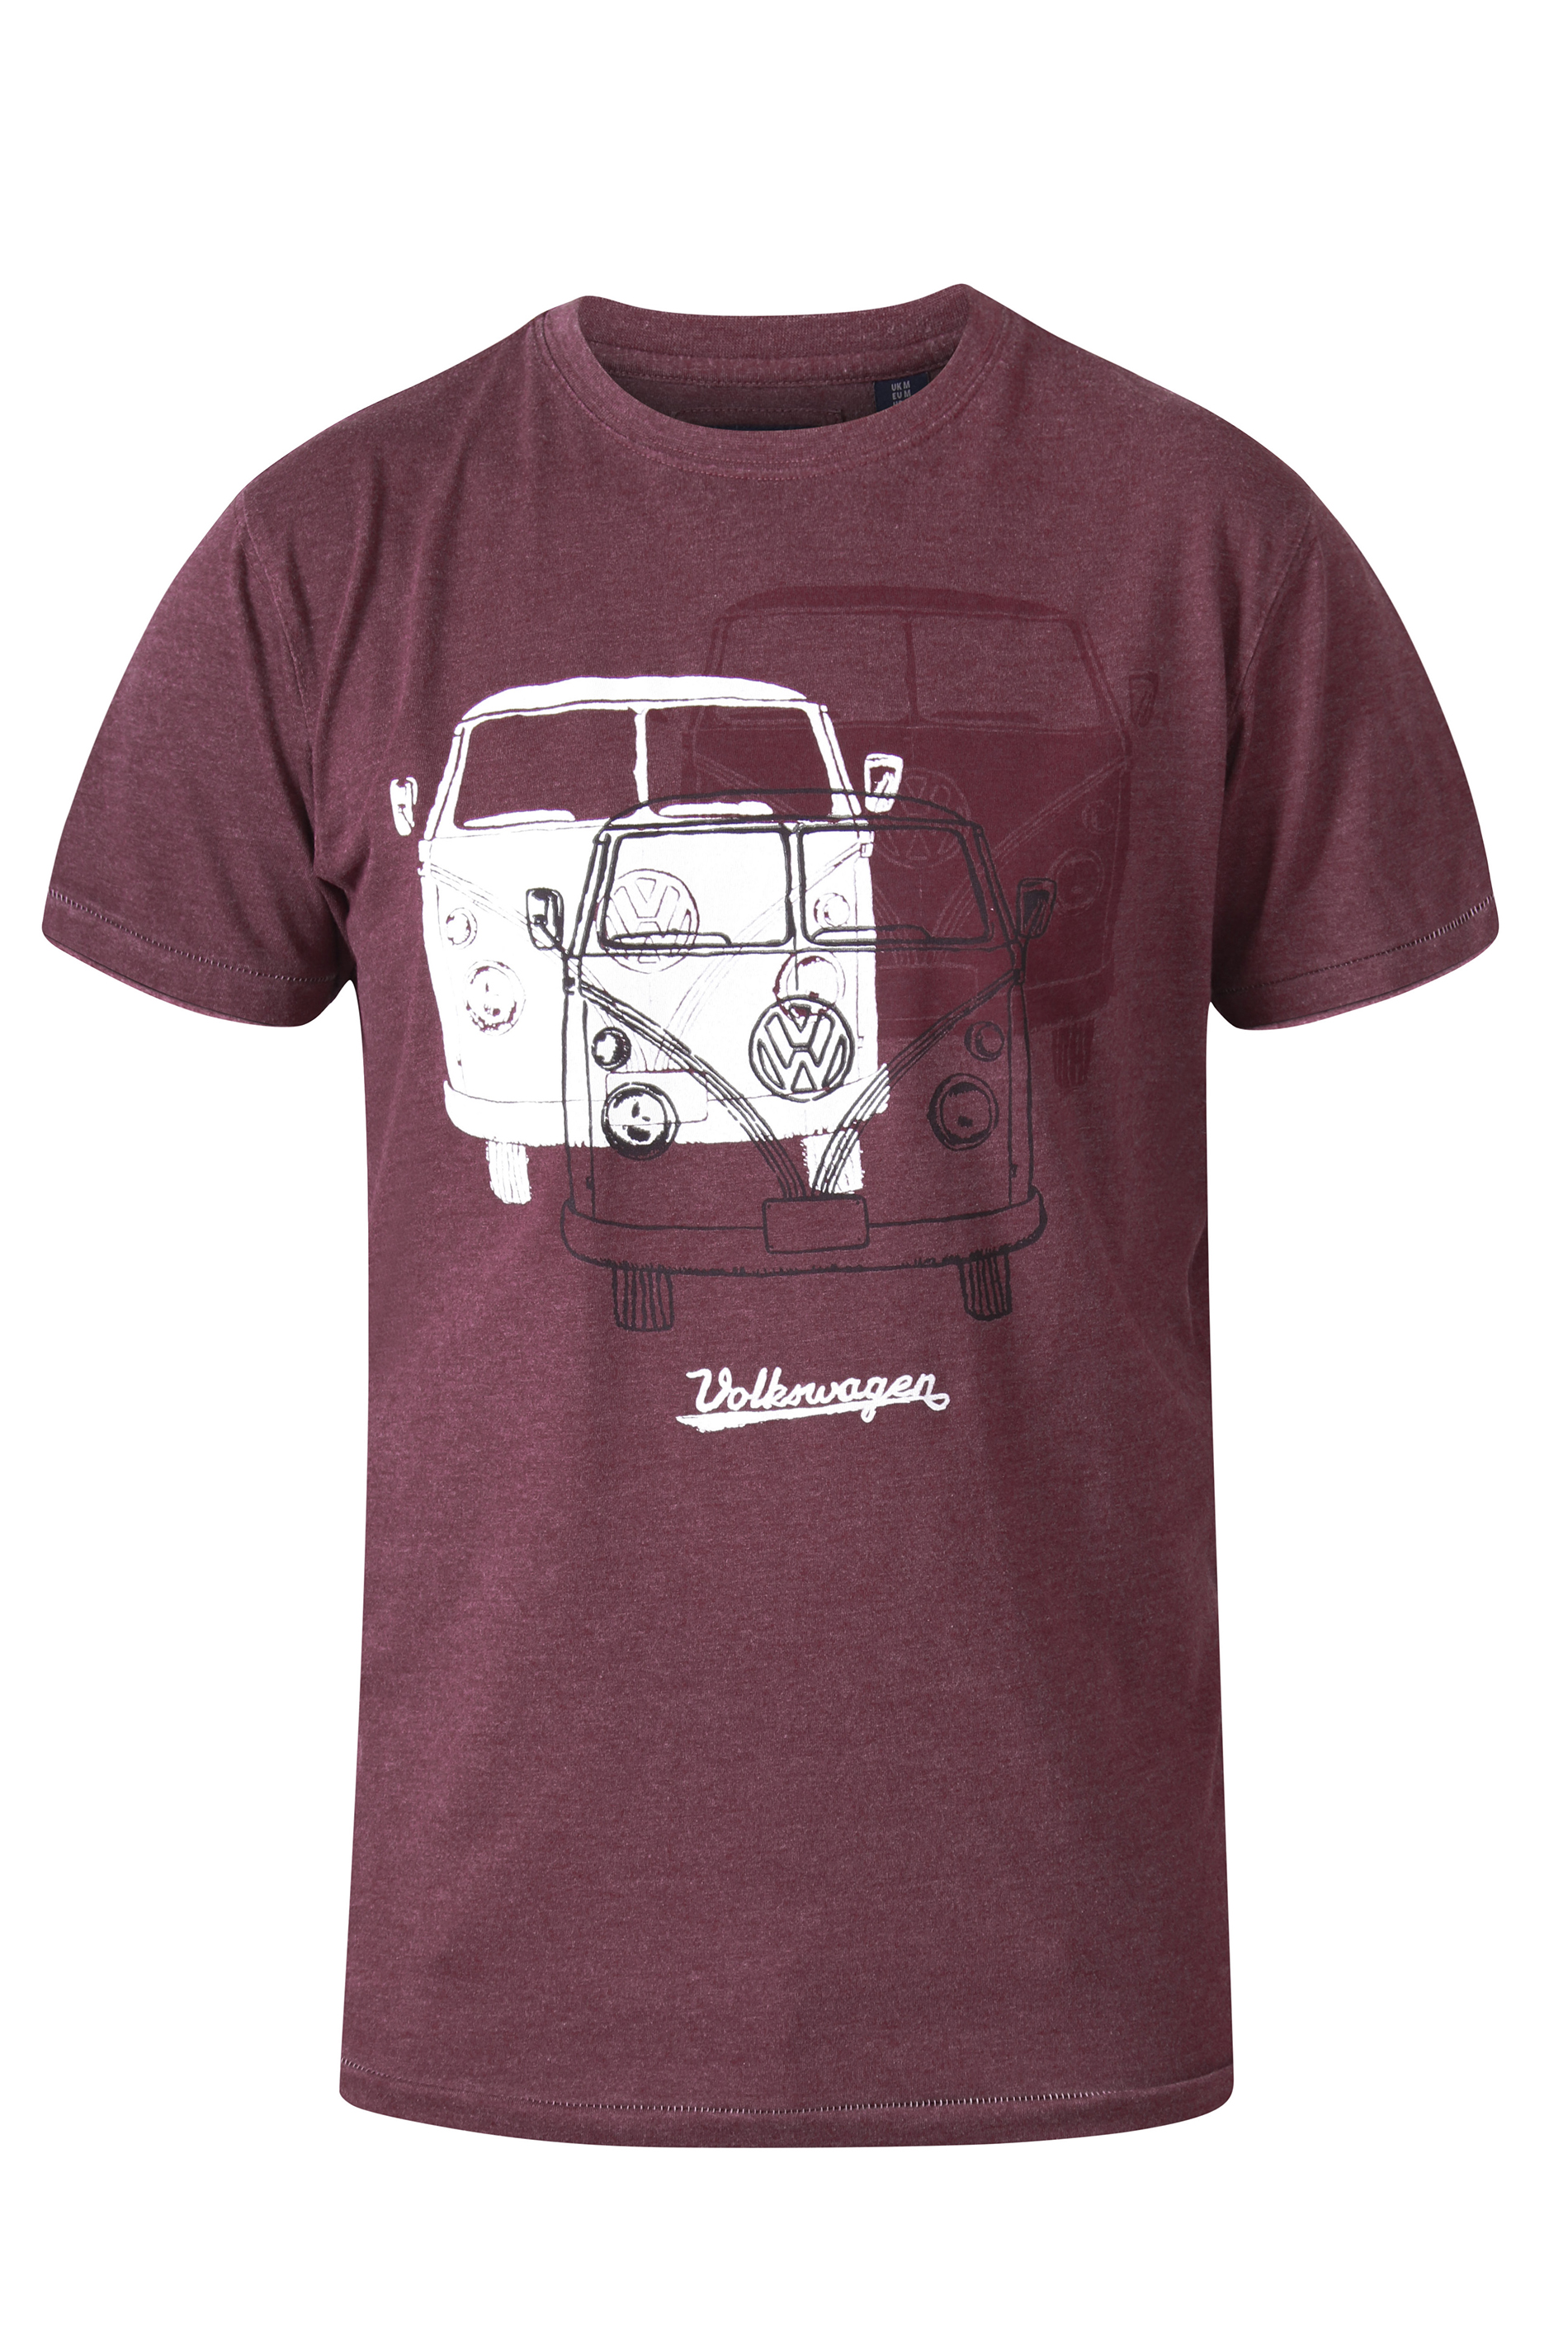 D555 Red Trio Campervan Printed T-Shirt